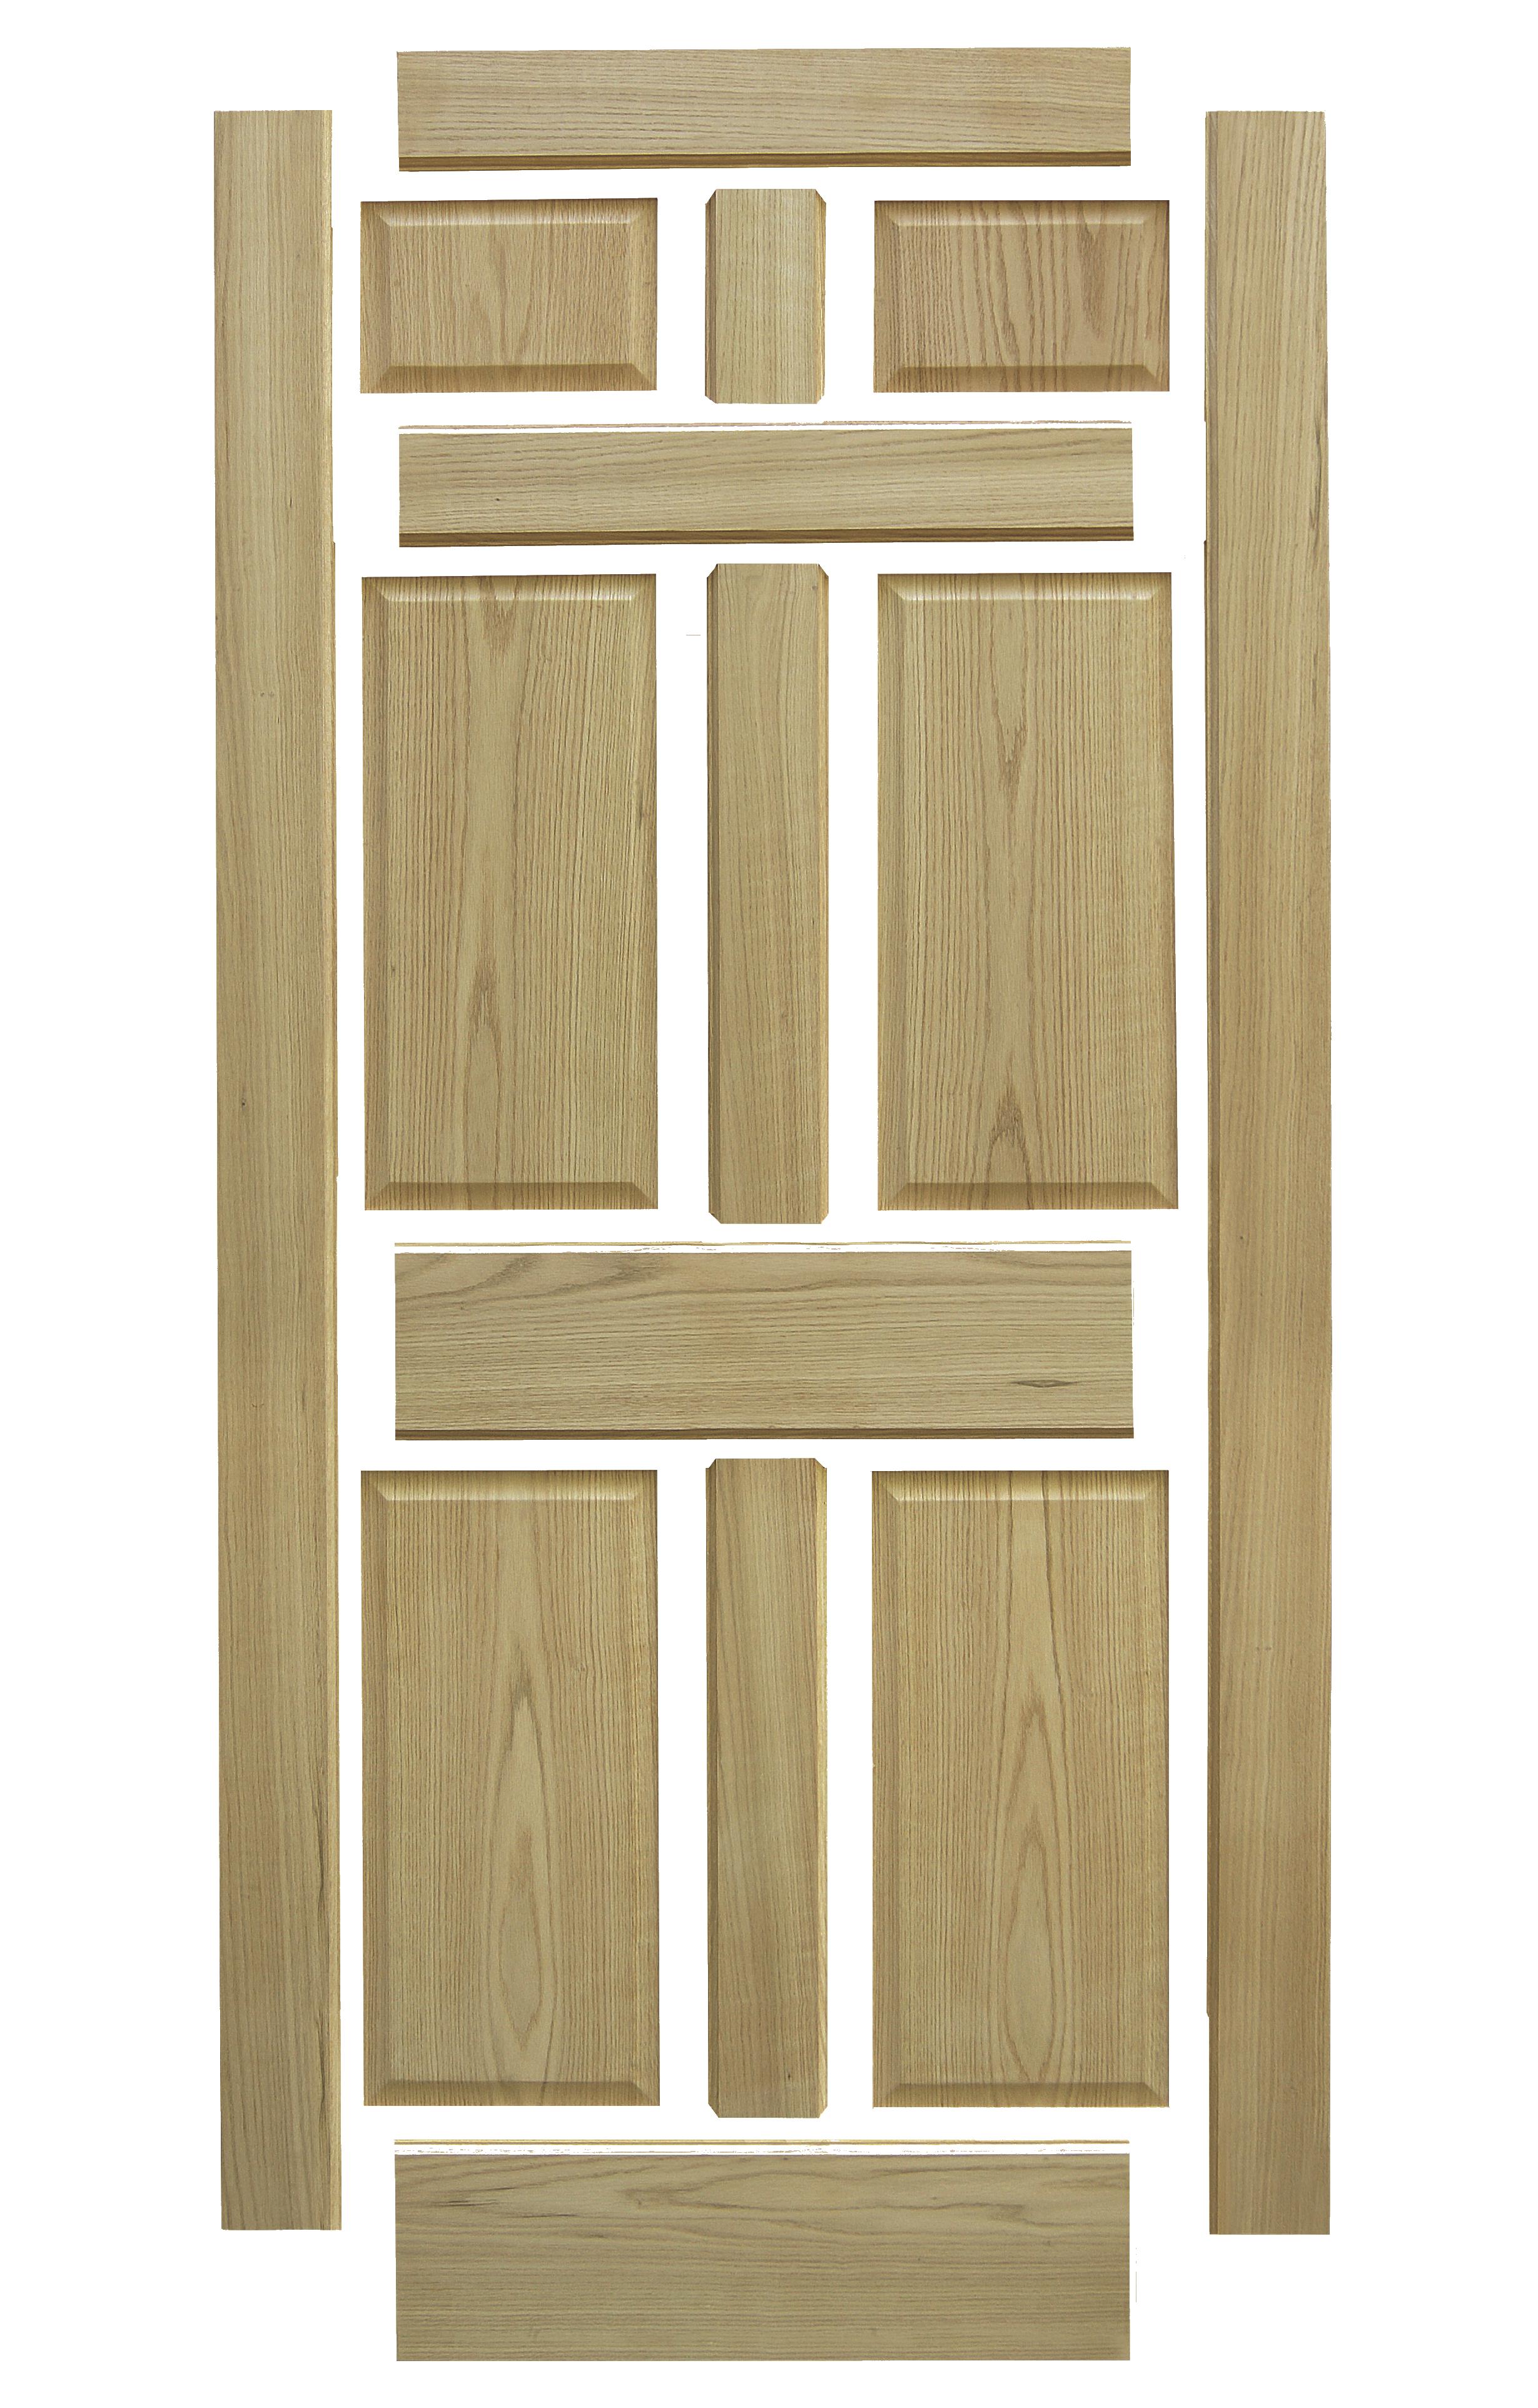 stile and rail wood door diagram